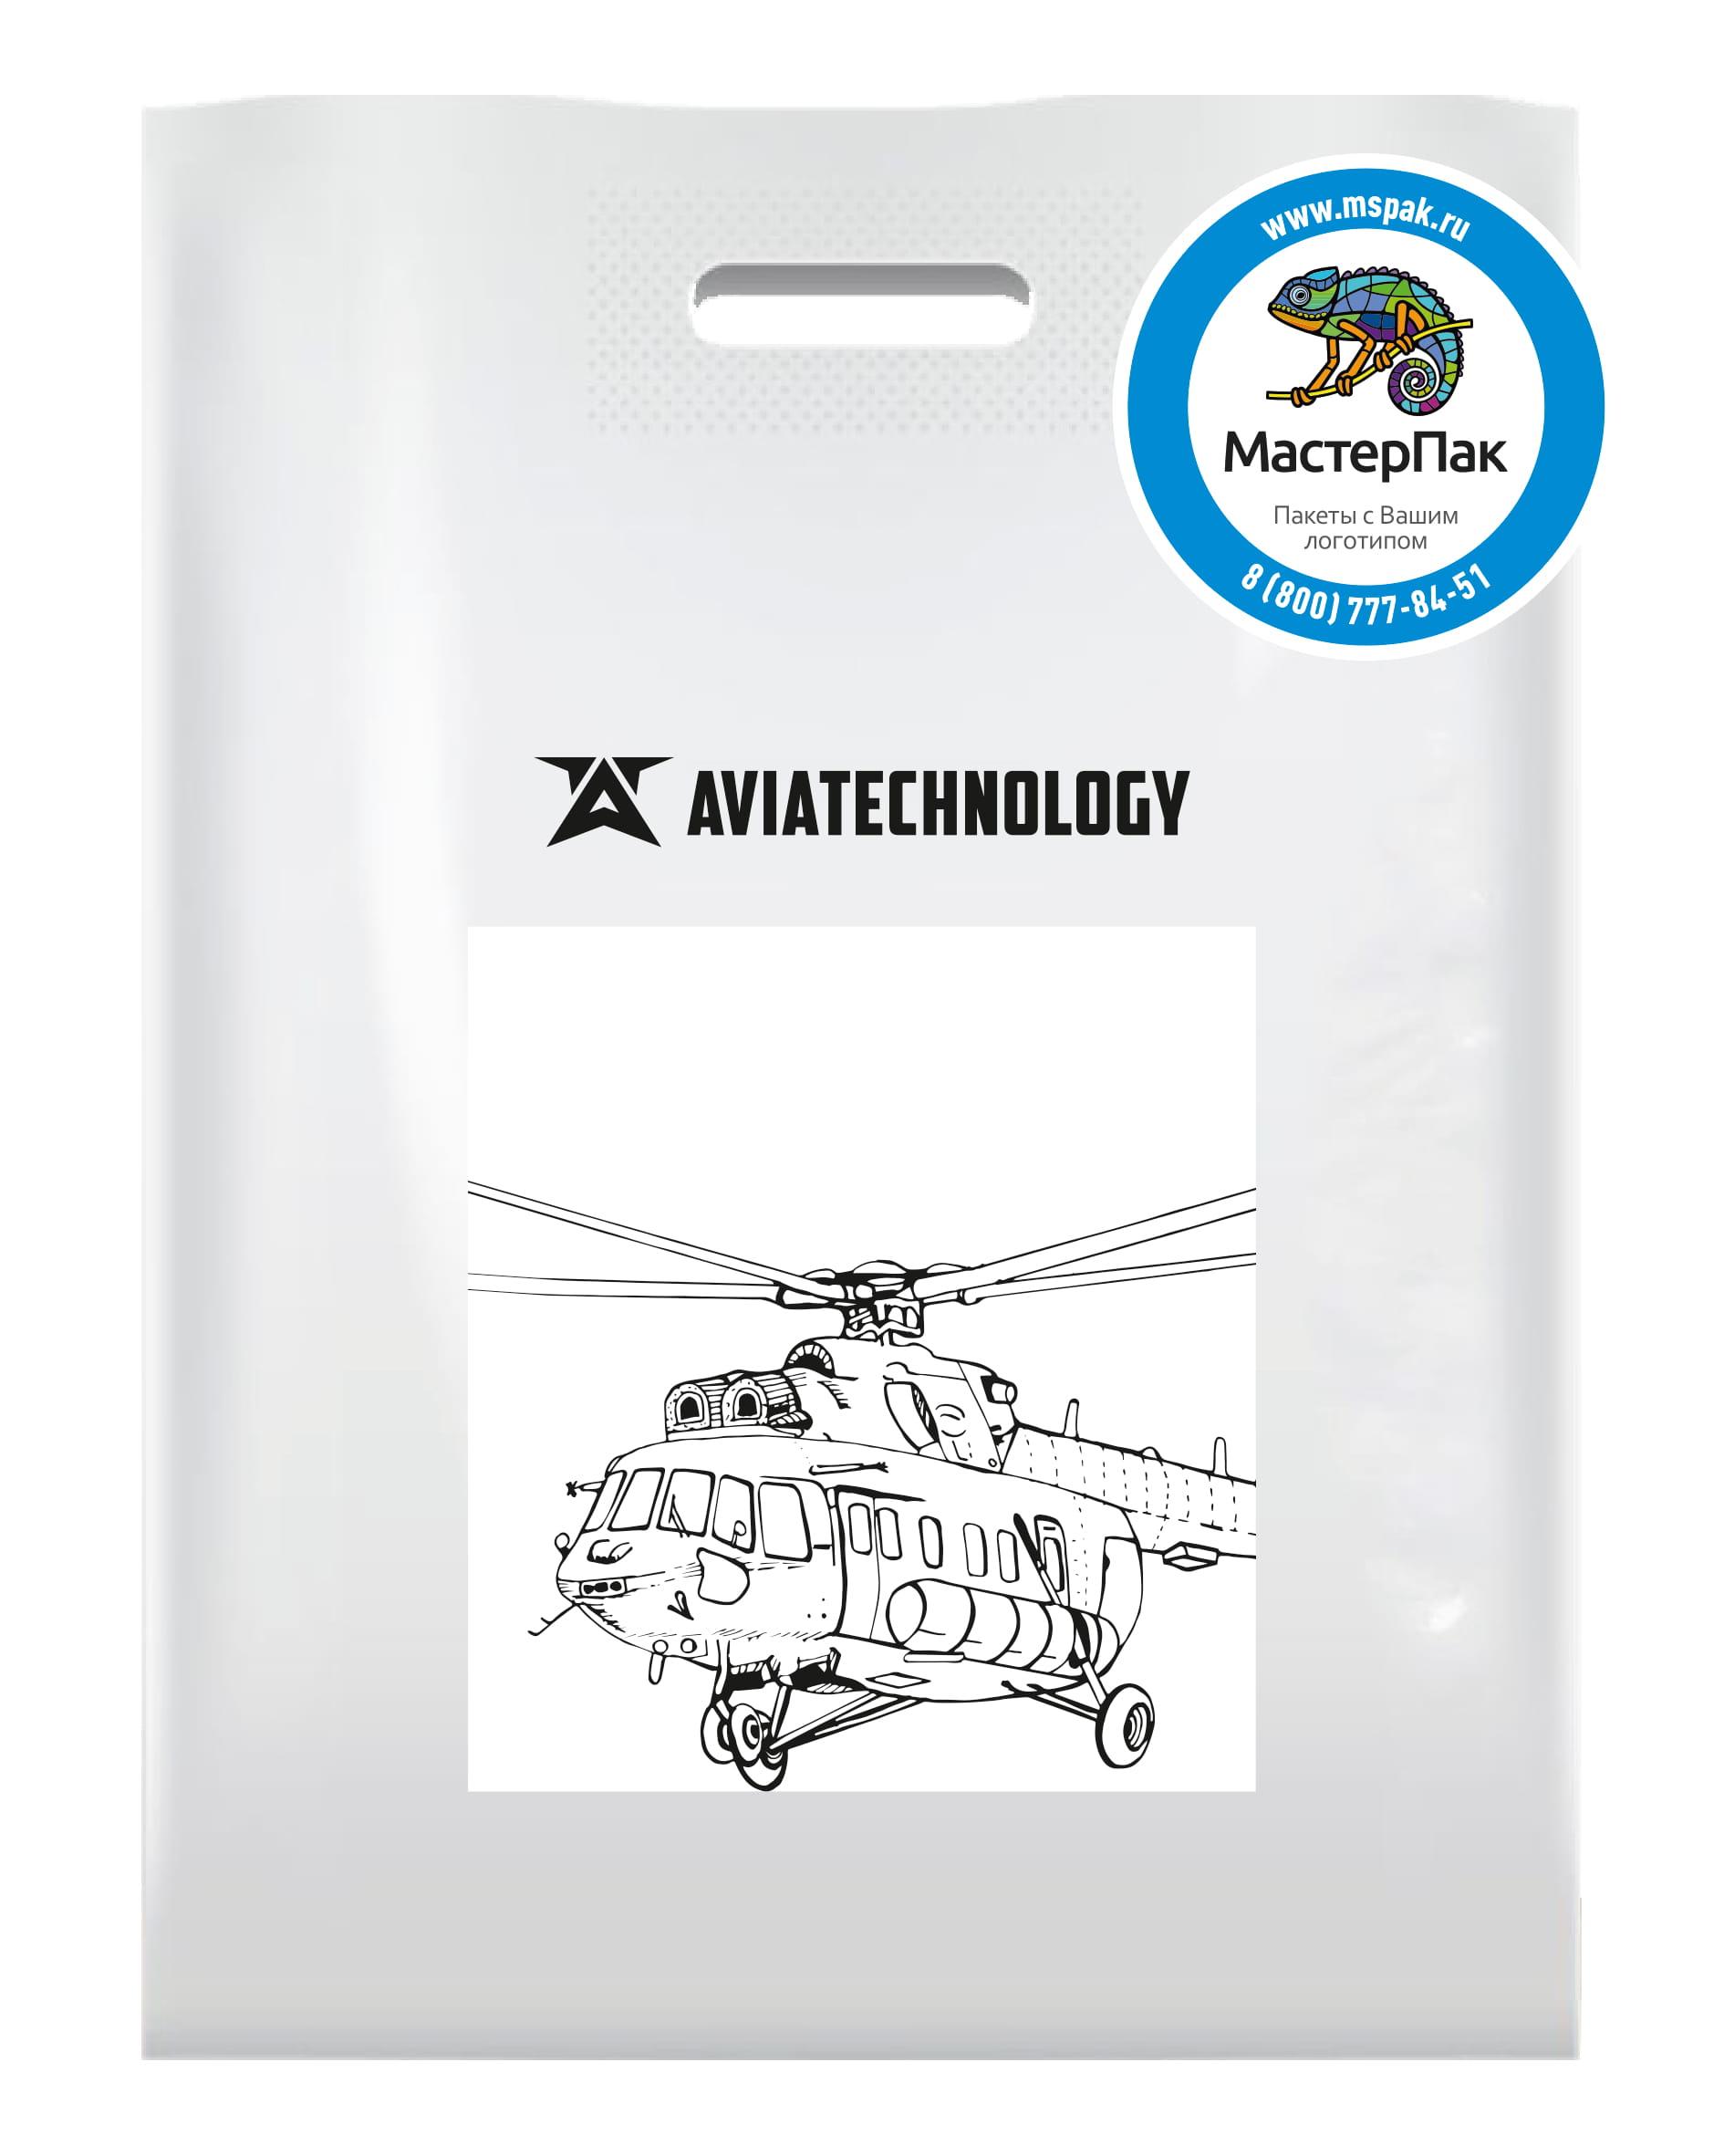 Пакет ПВД с логотипом Aviatechnology, Москва, белый